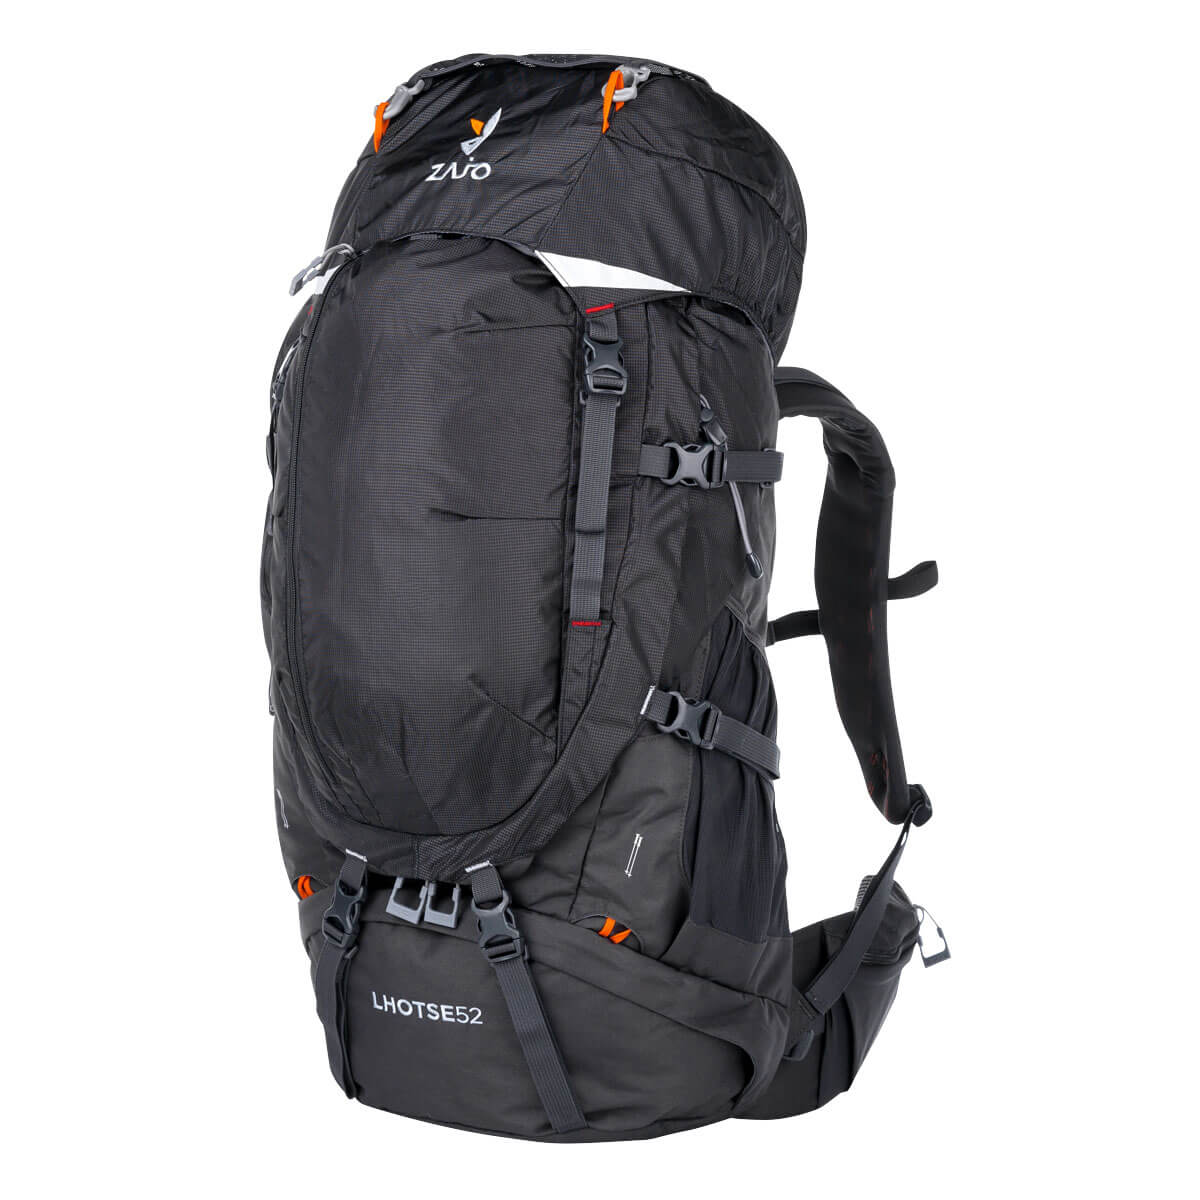 Batoh Zajo Lhotse 52 Backpack